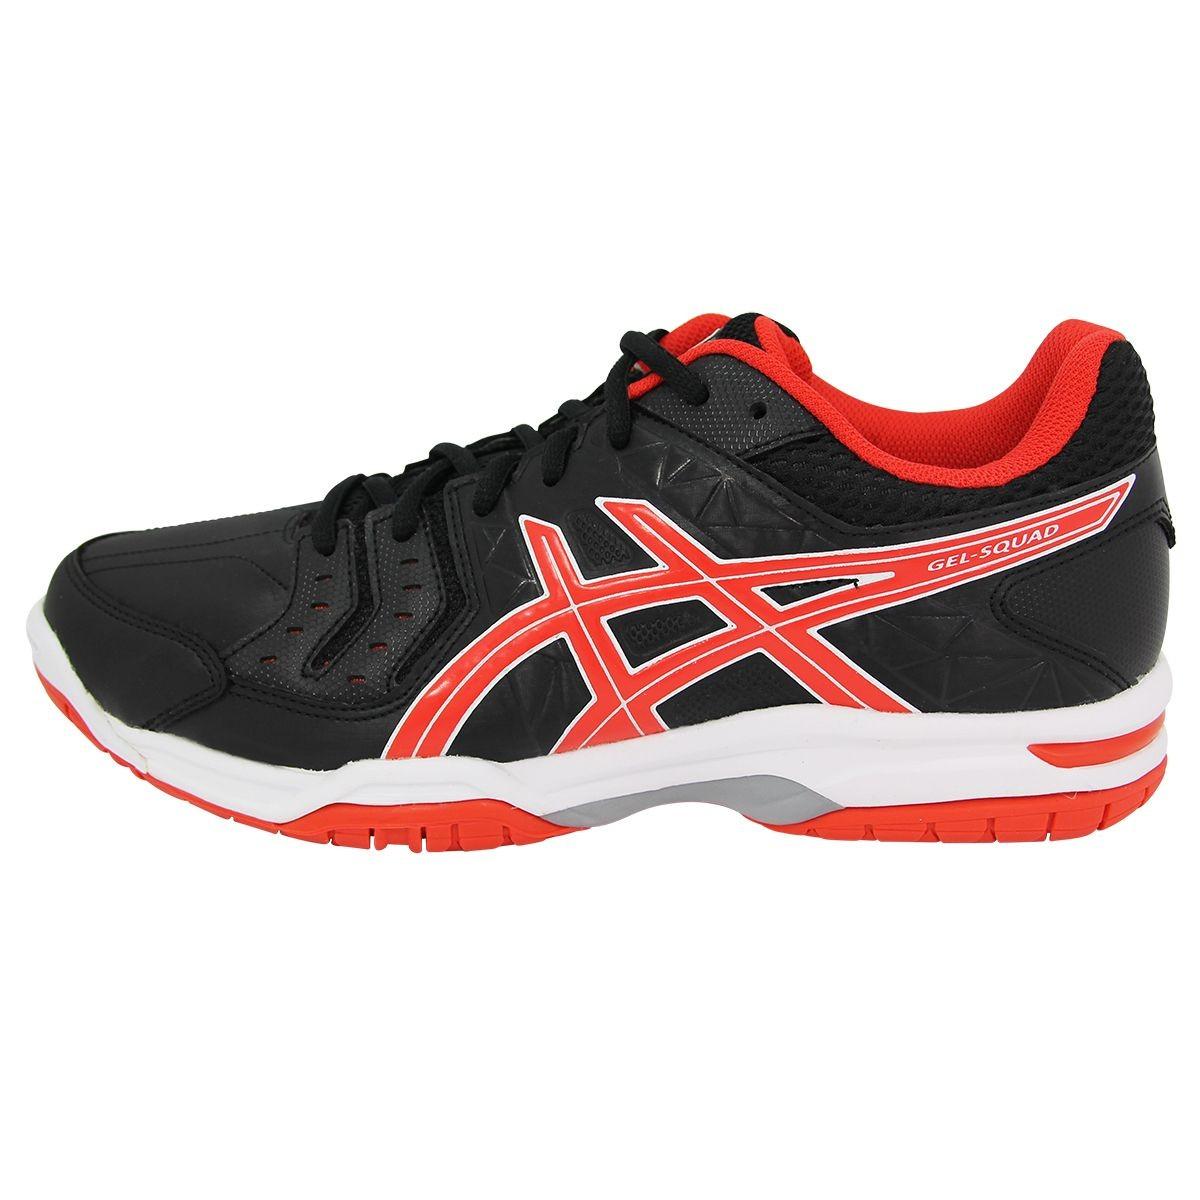 Chaussures de handball adulte Asics Gel Squad bleu et orange 20172018 avis test